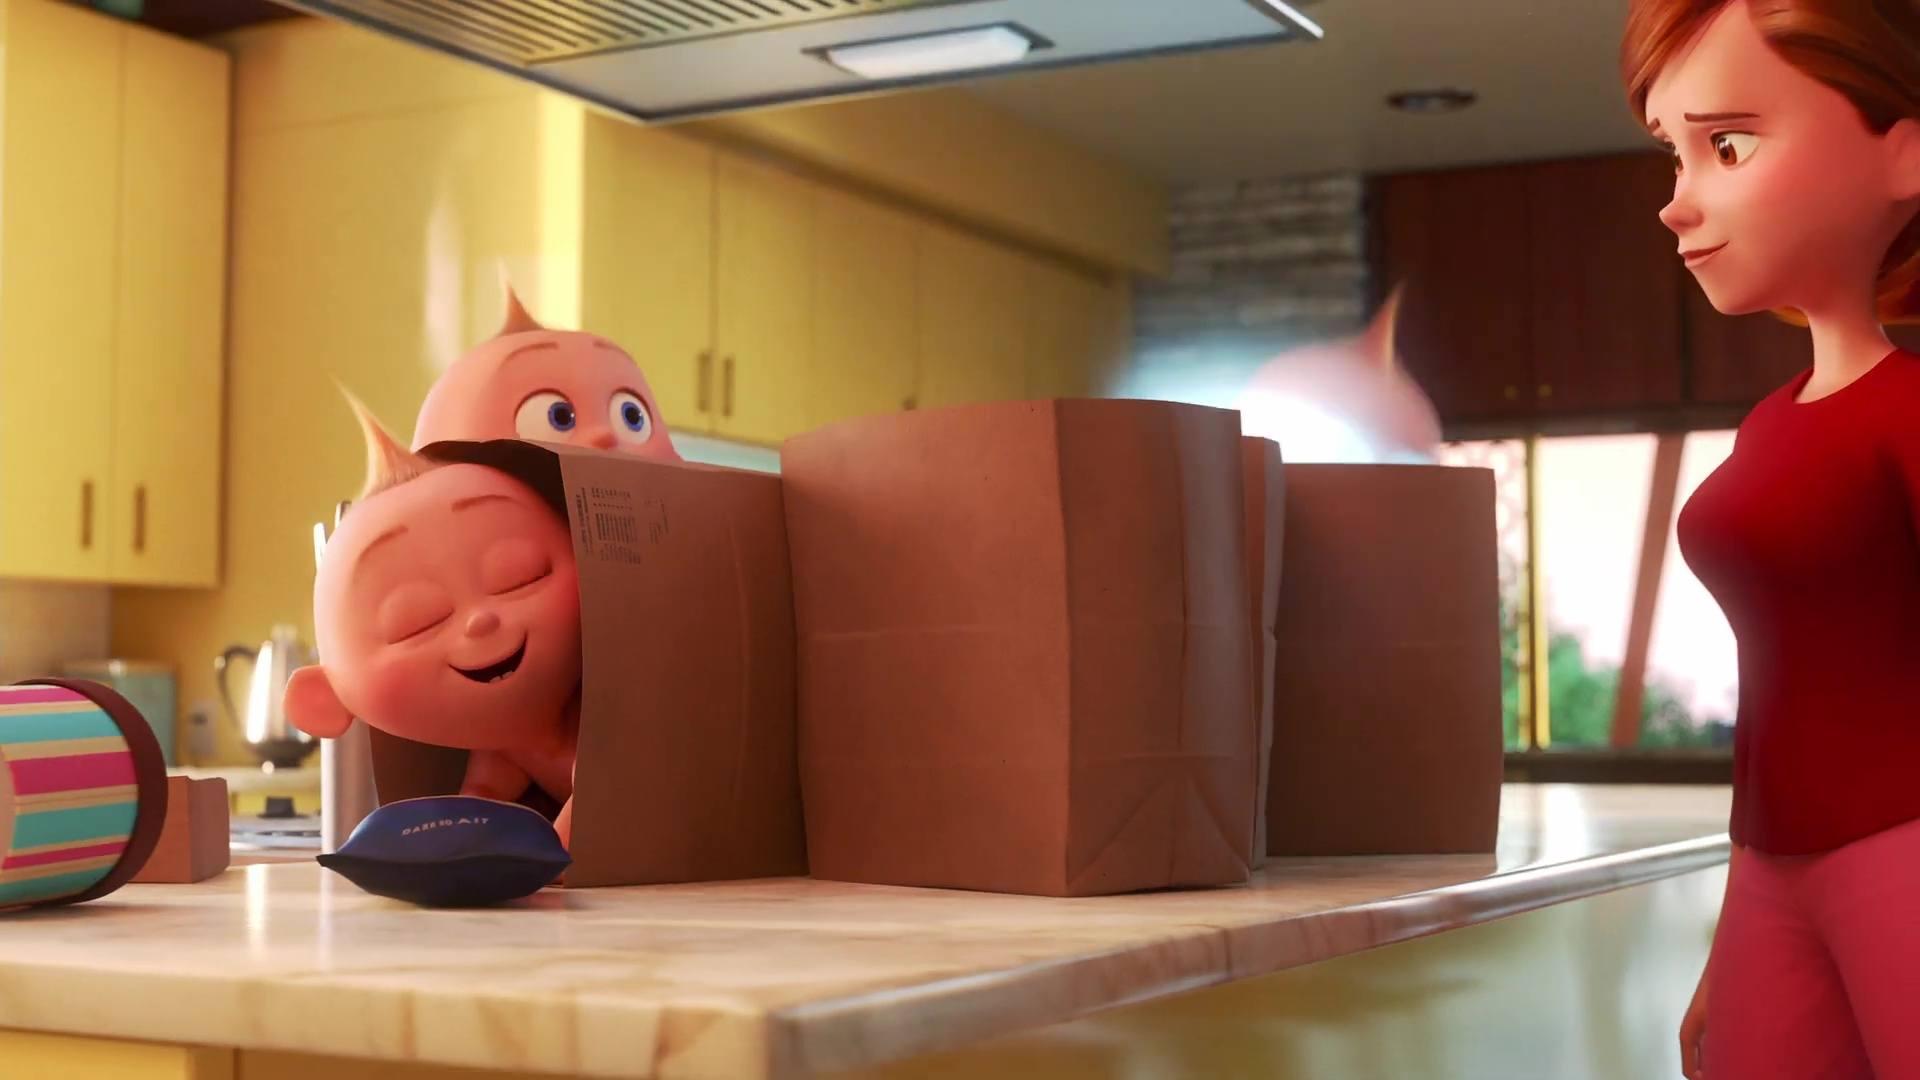 image chore day incredibles way pixar popcorn disney